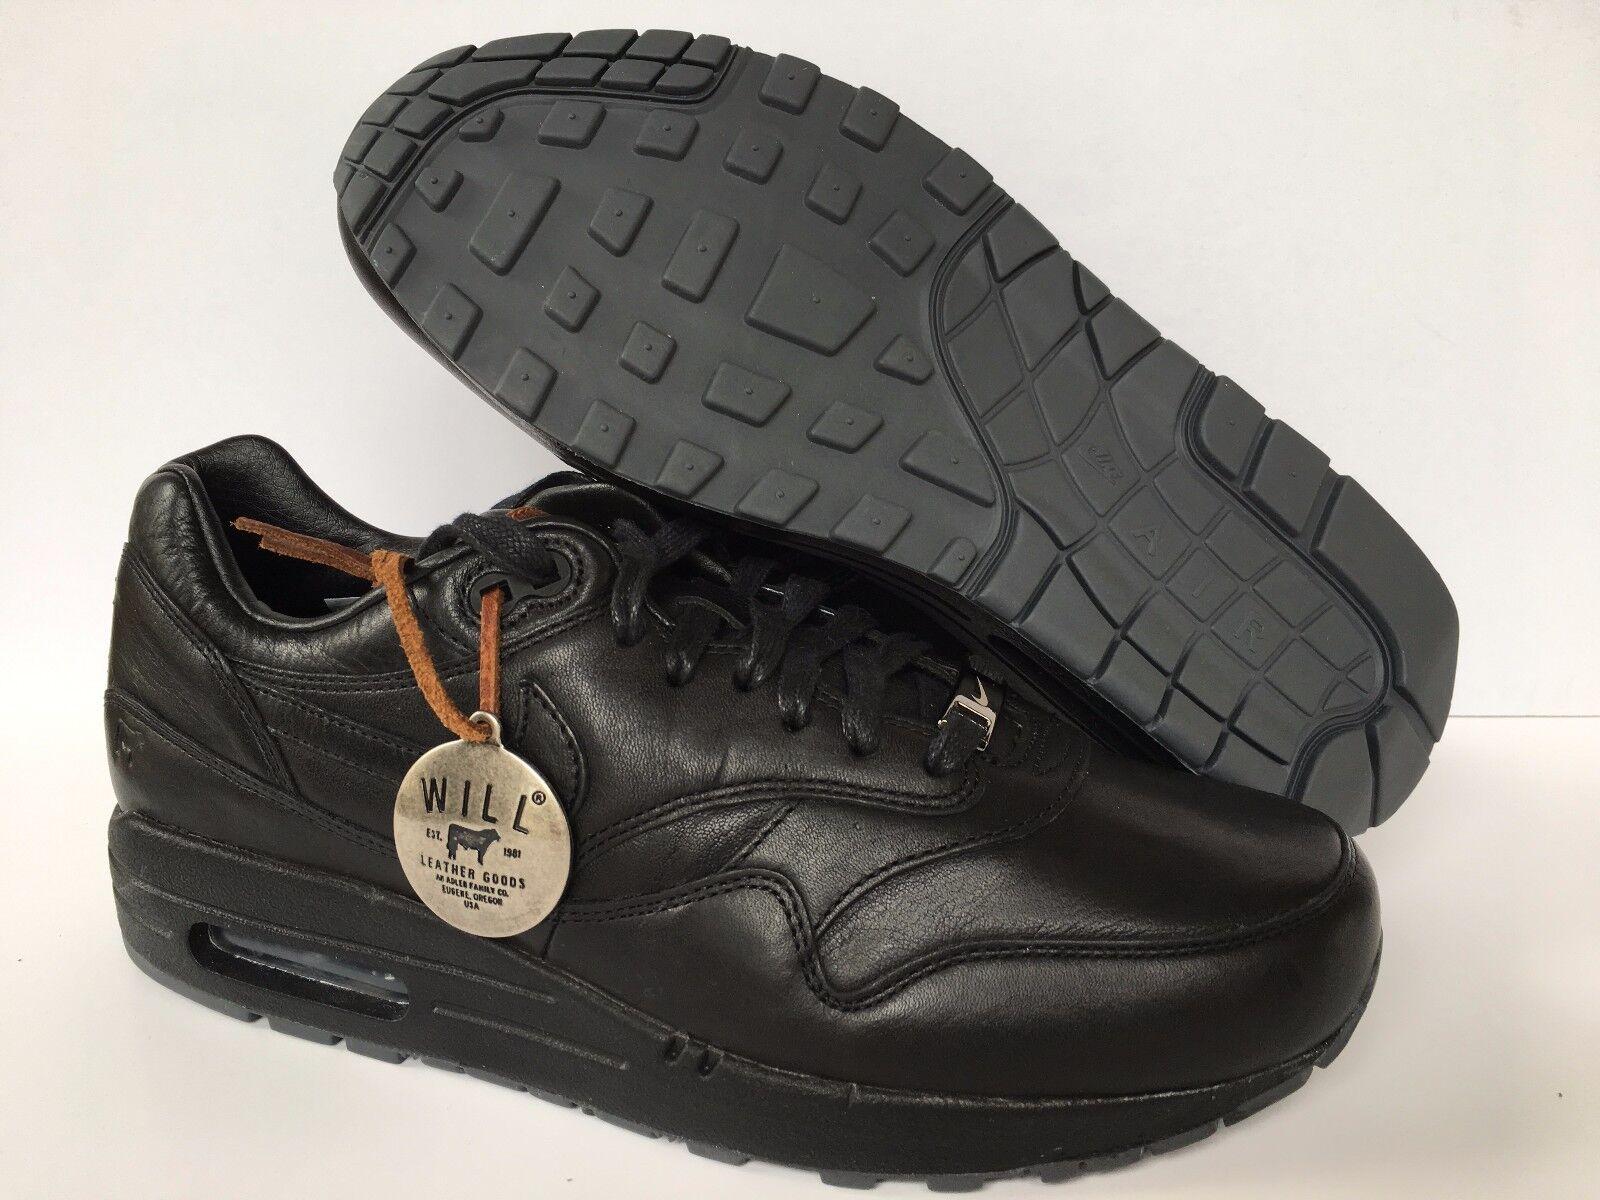 NIKE AIR MAX 1 ID WILL PREMIUM LEATHER schwarz SZ 8